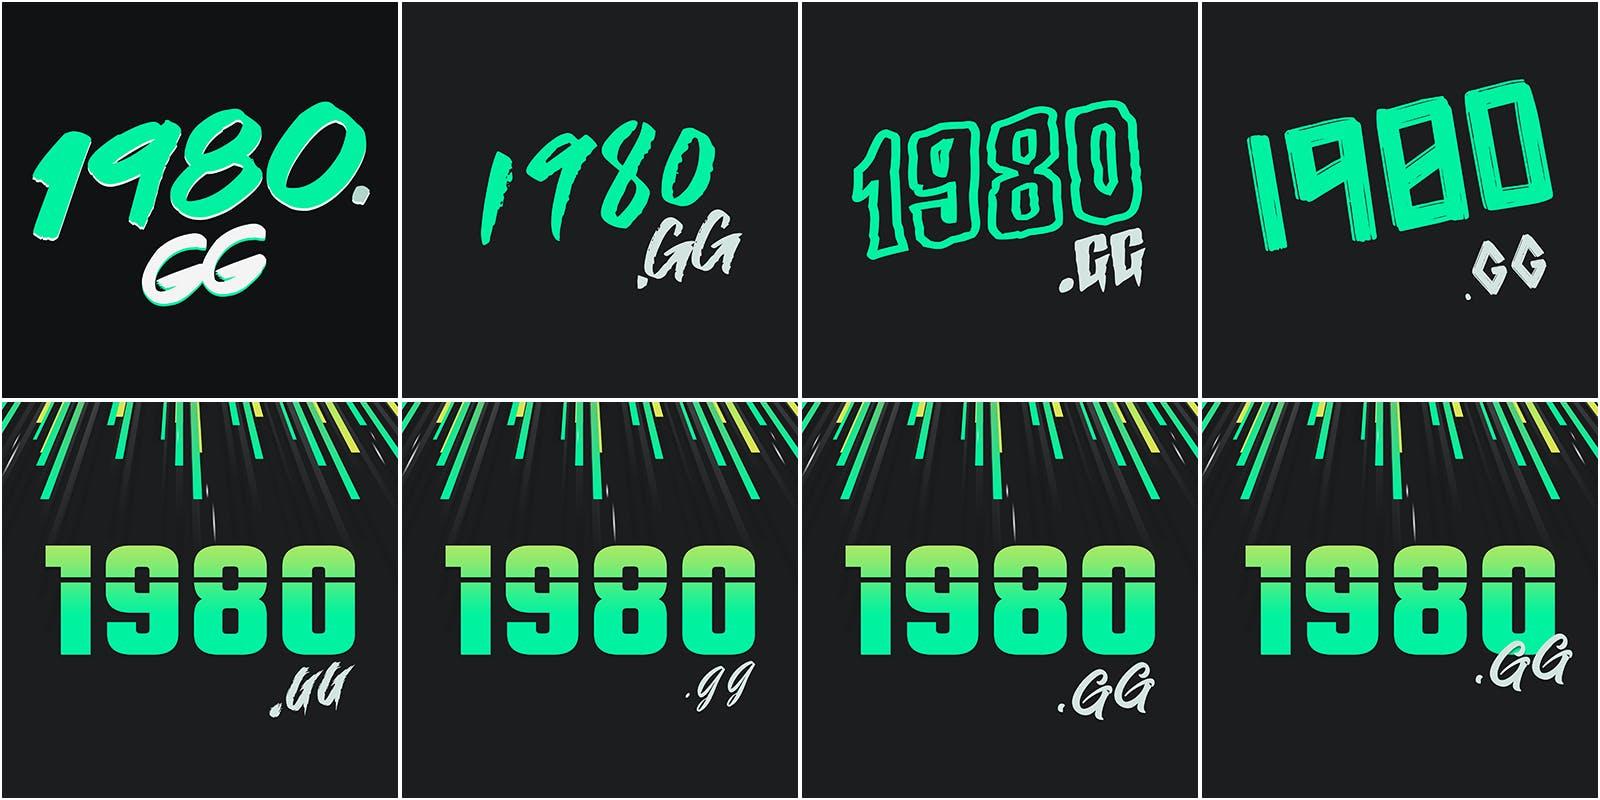 1980.gg logo Tests.jpg